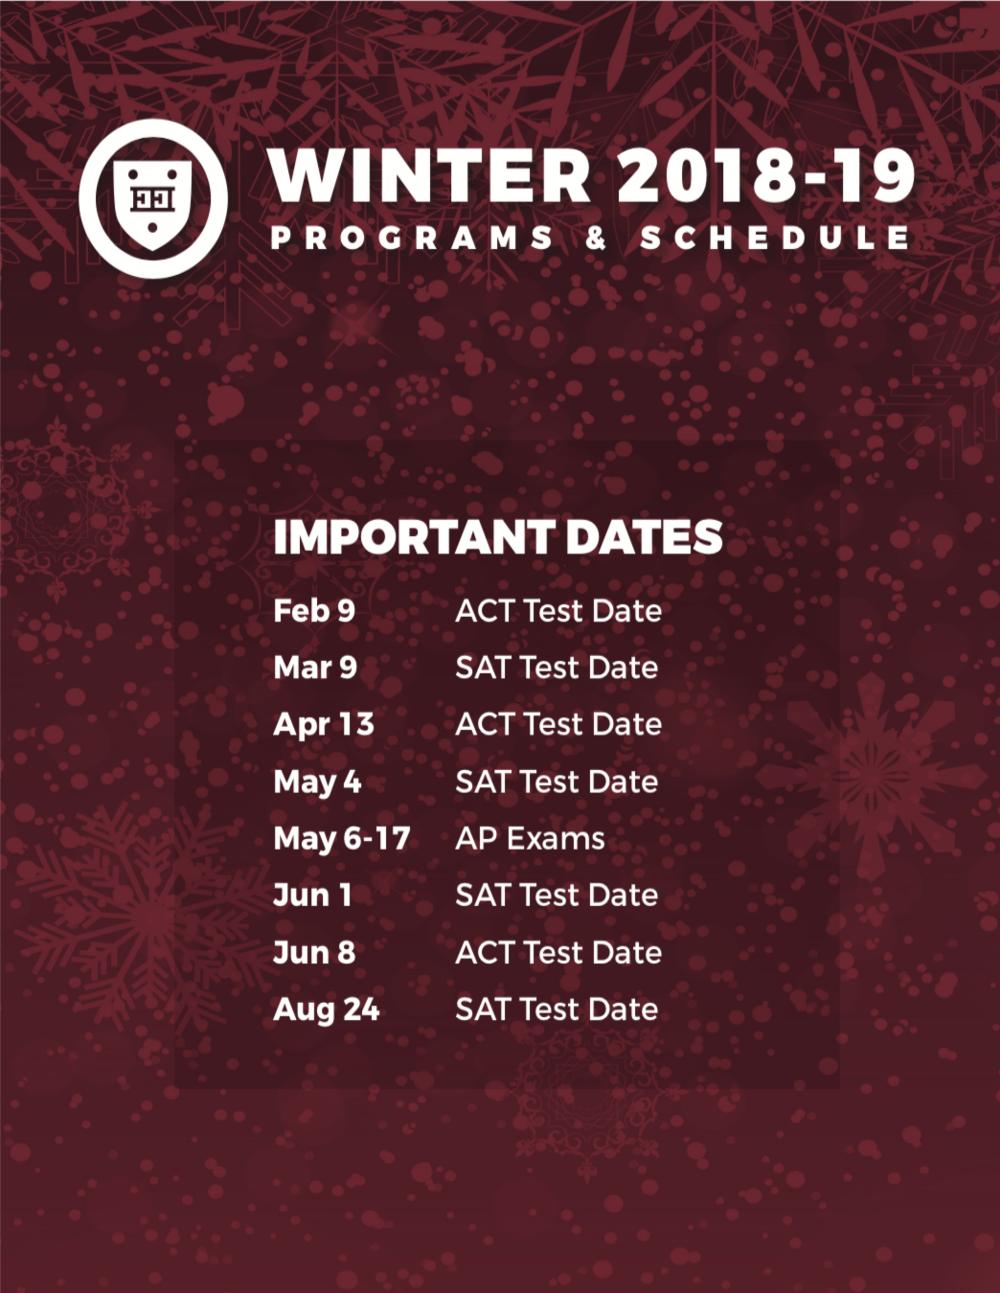 Winter 2018-19